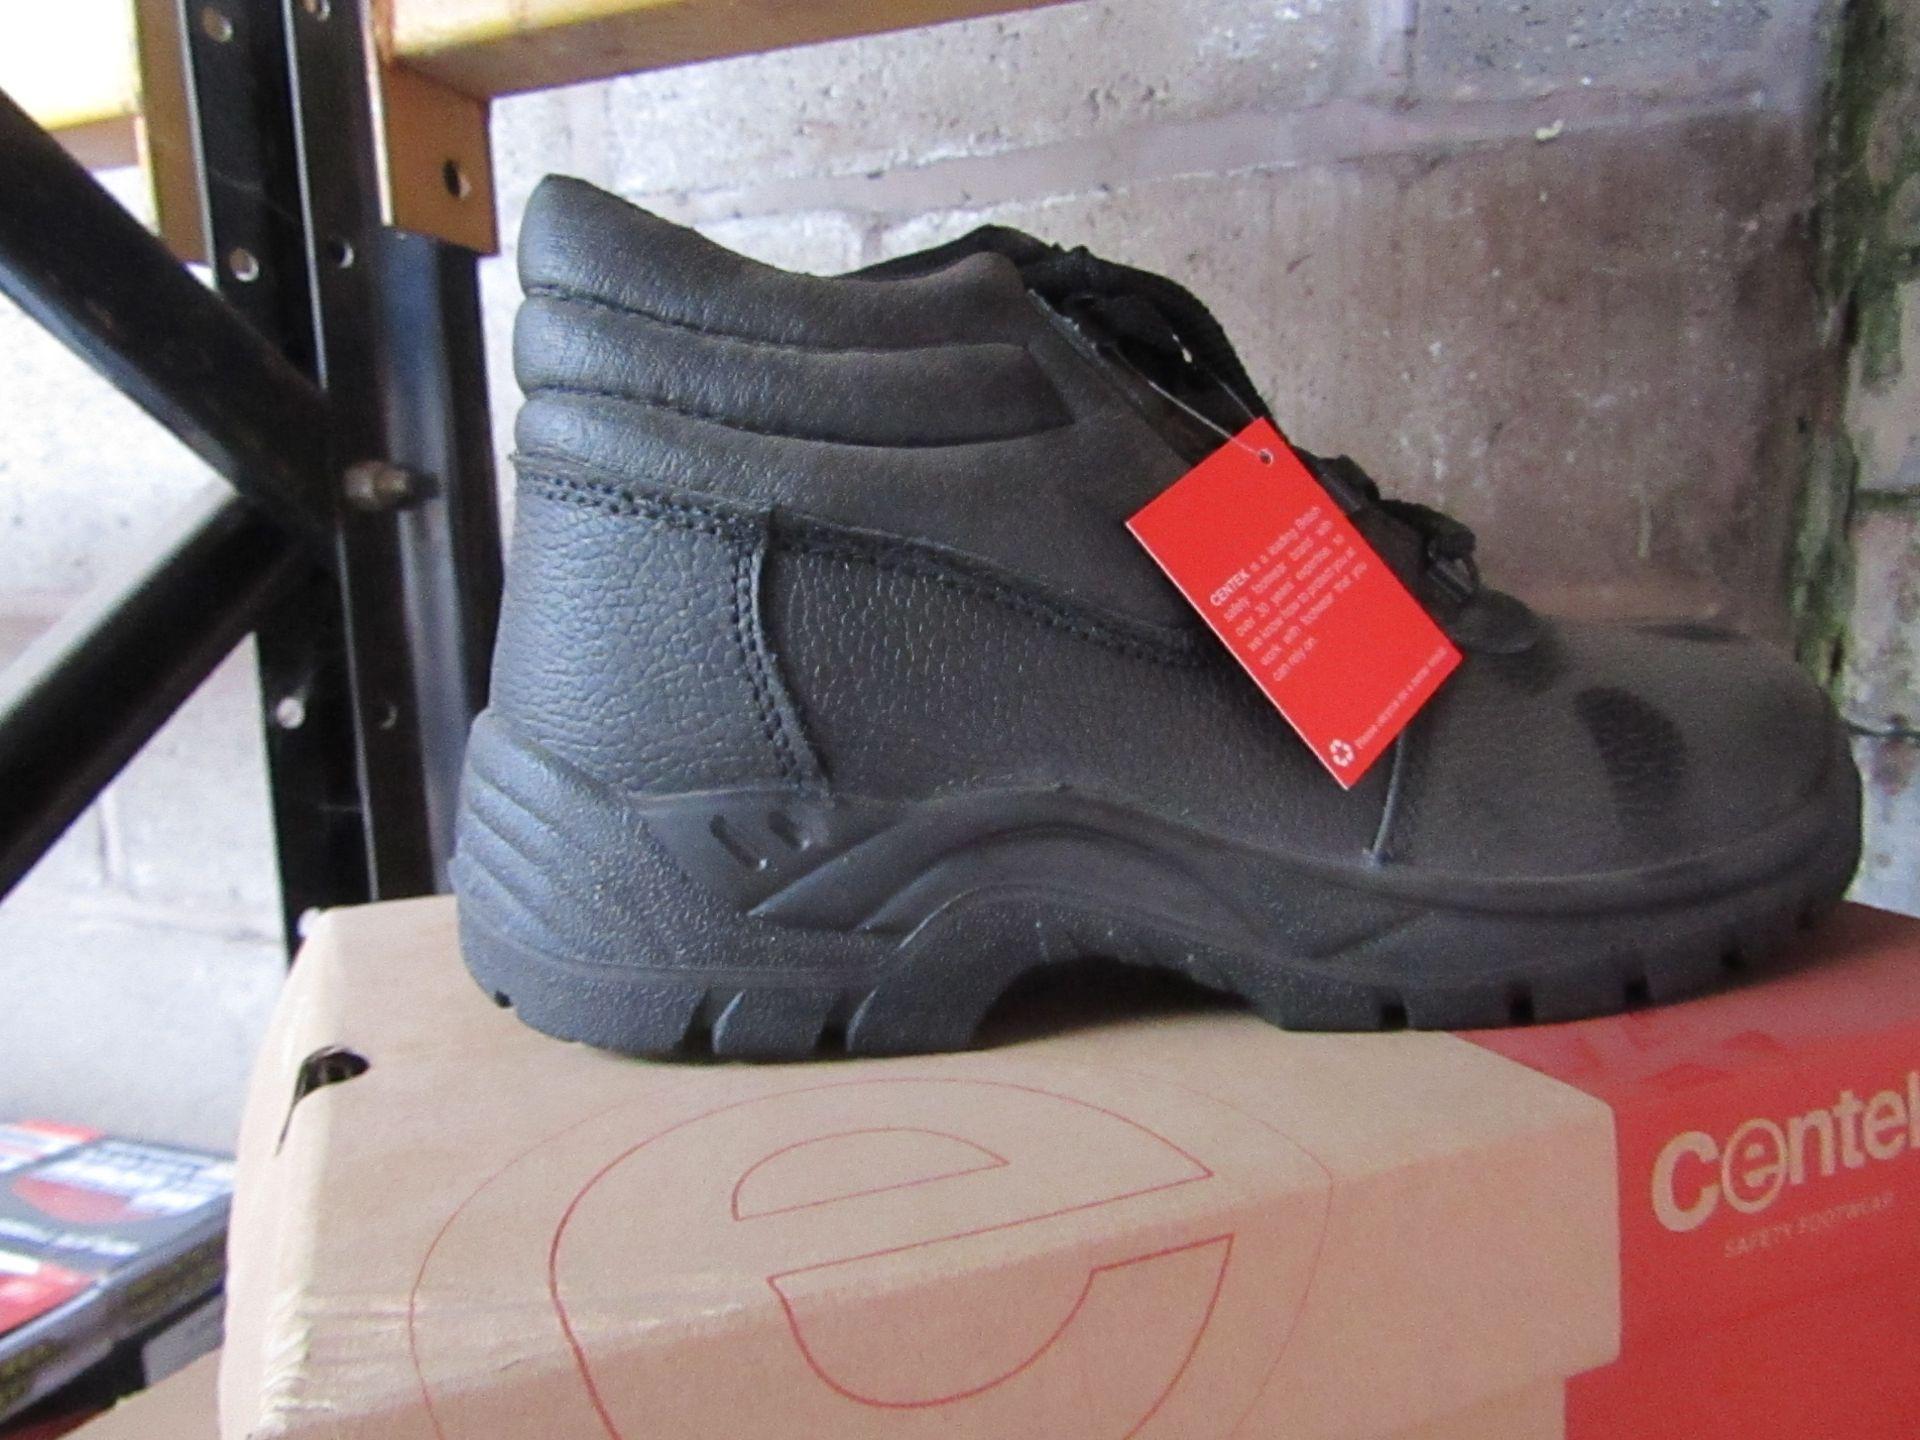 Lot 81 - Centek - Black Steel Toe Cap Boot - Size 9 - New & Boxed.